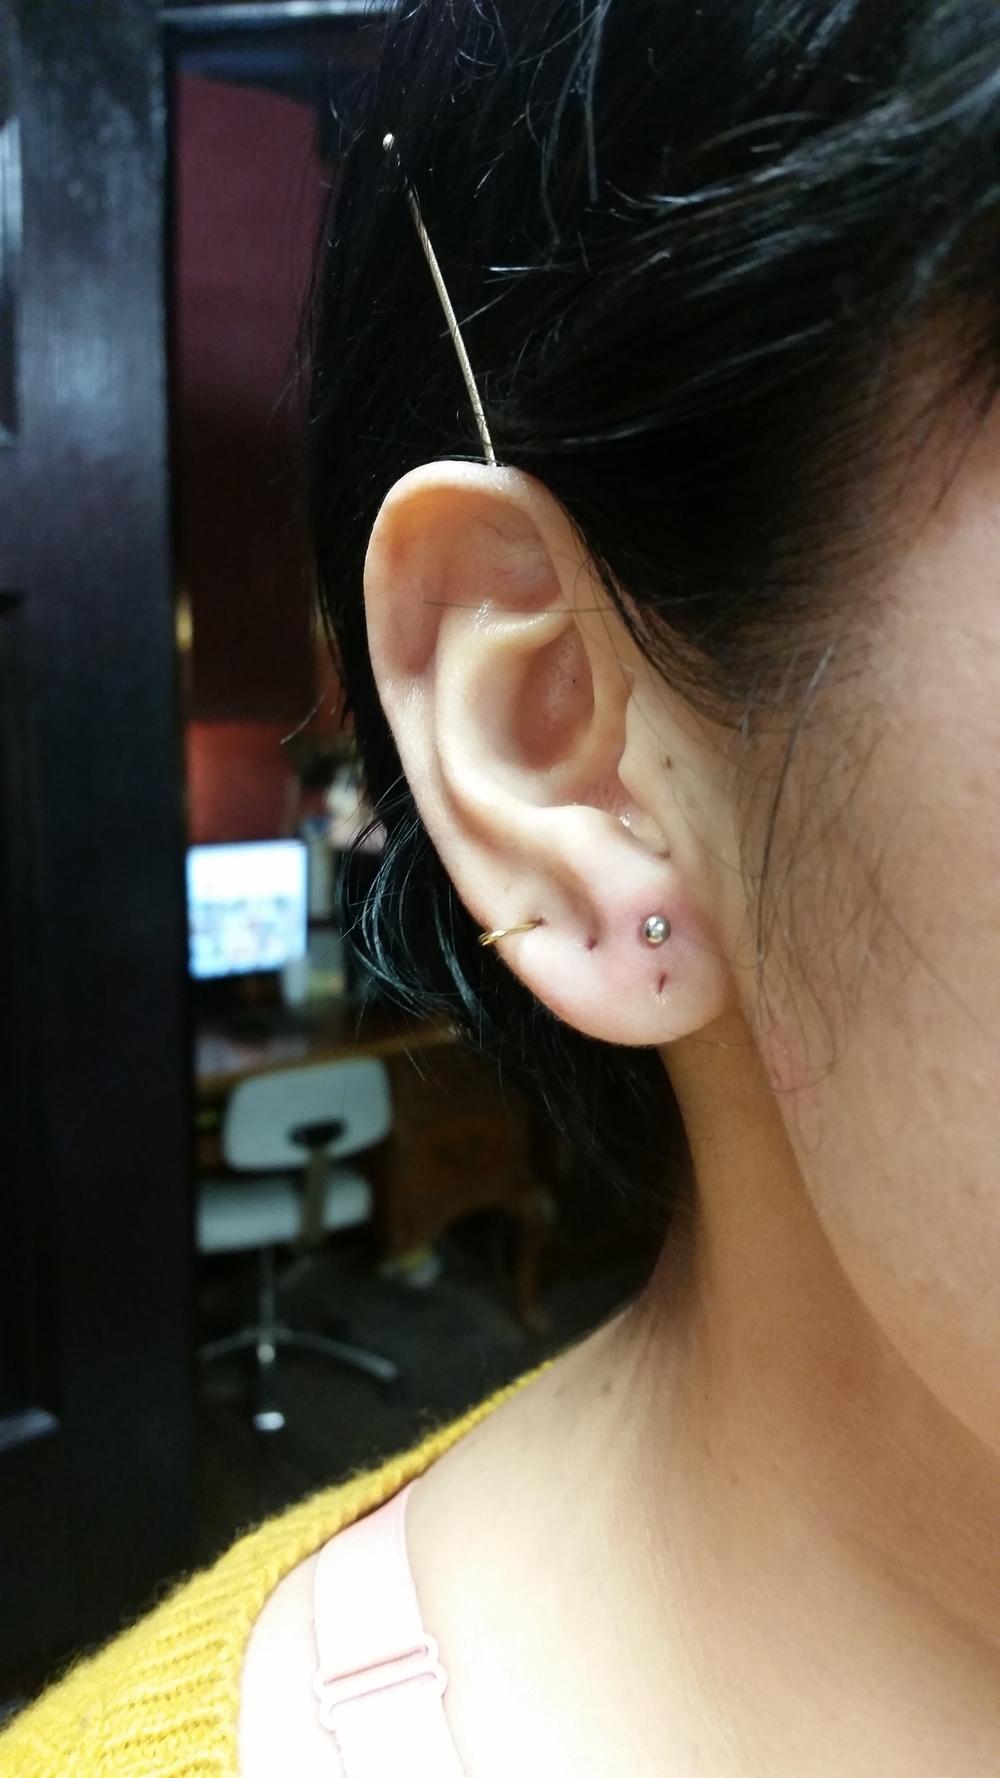 Higher Lobe Piercing